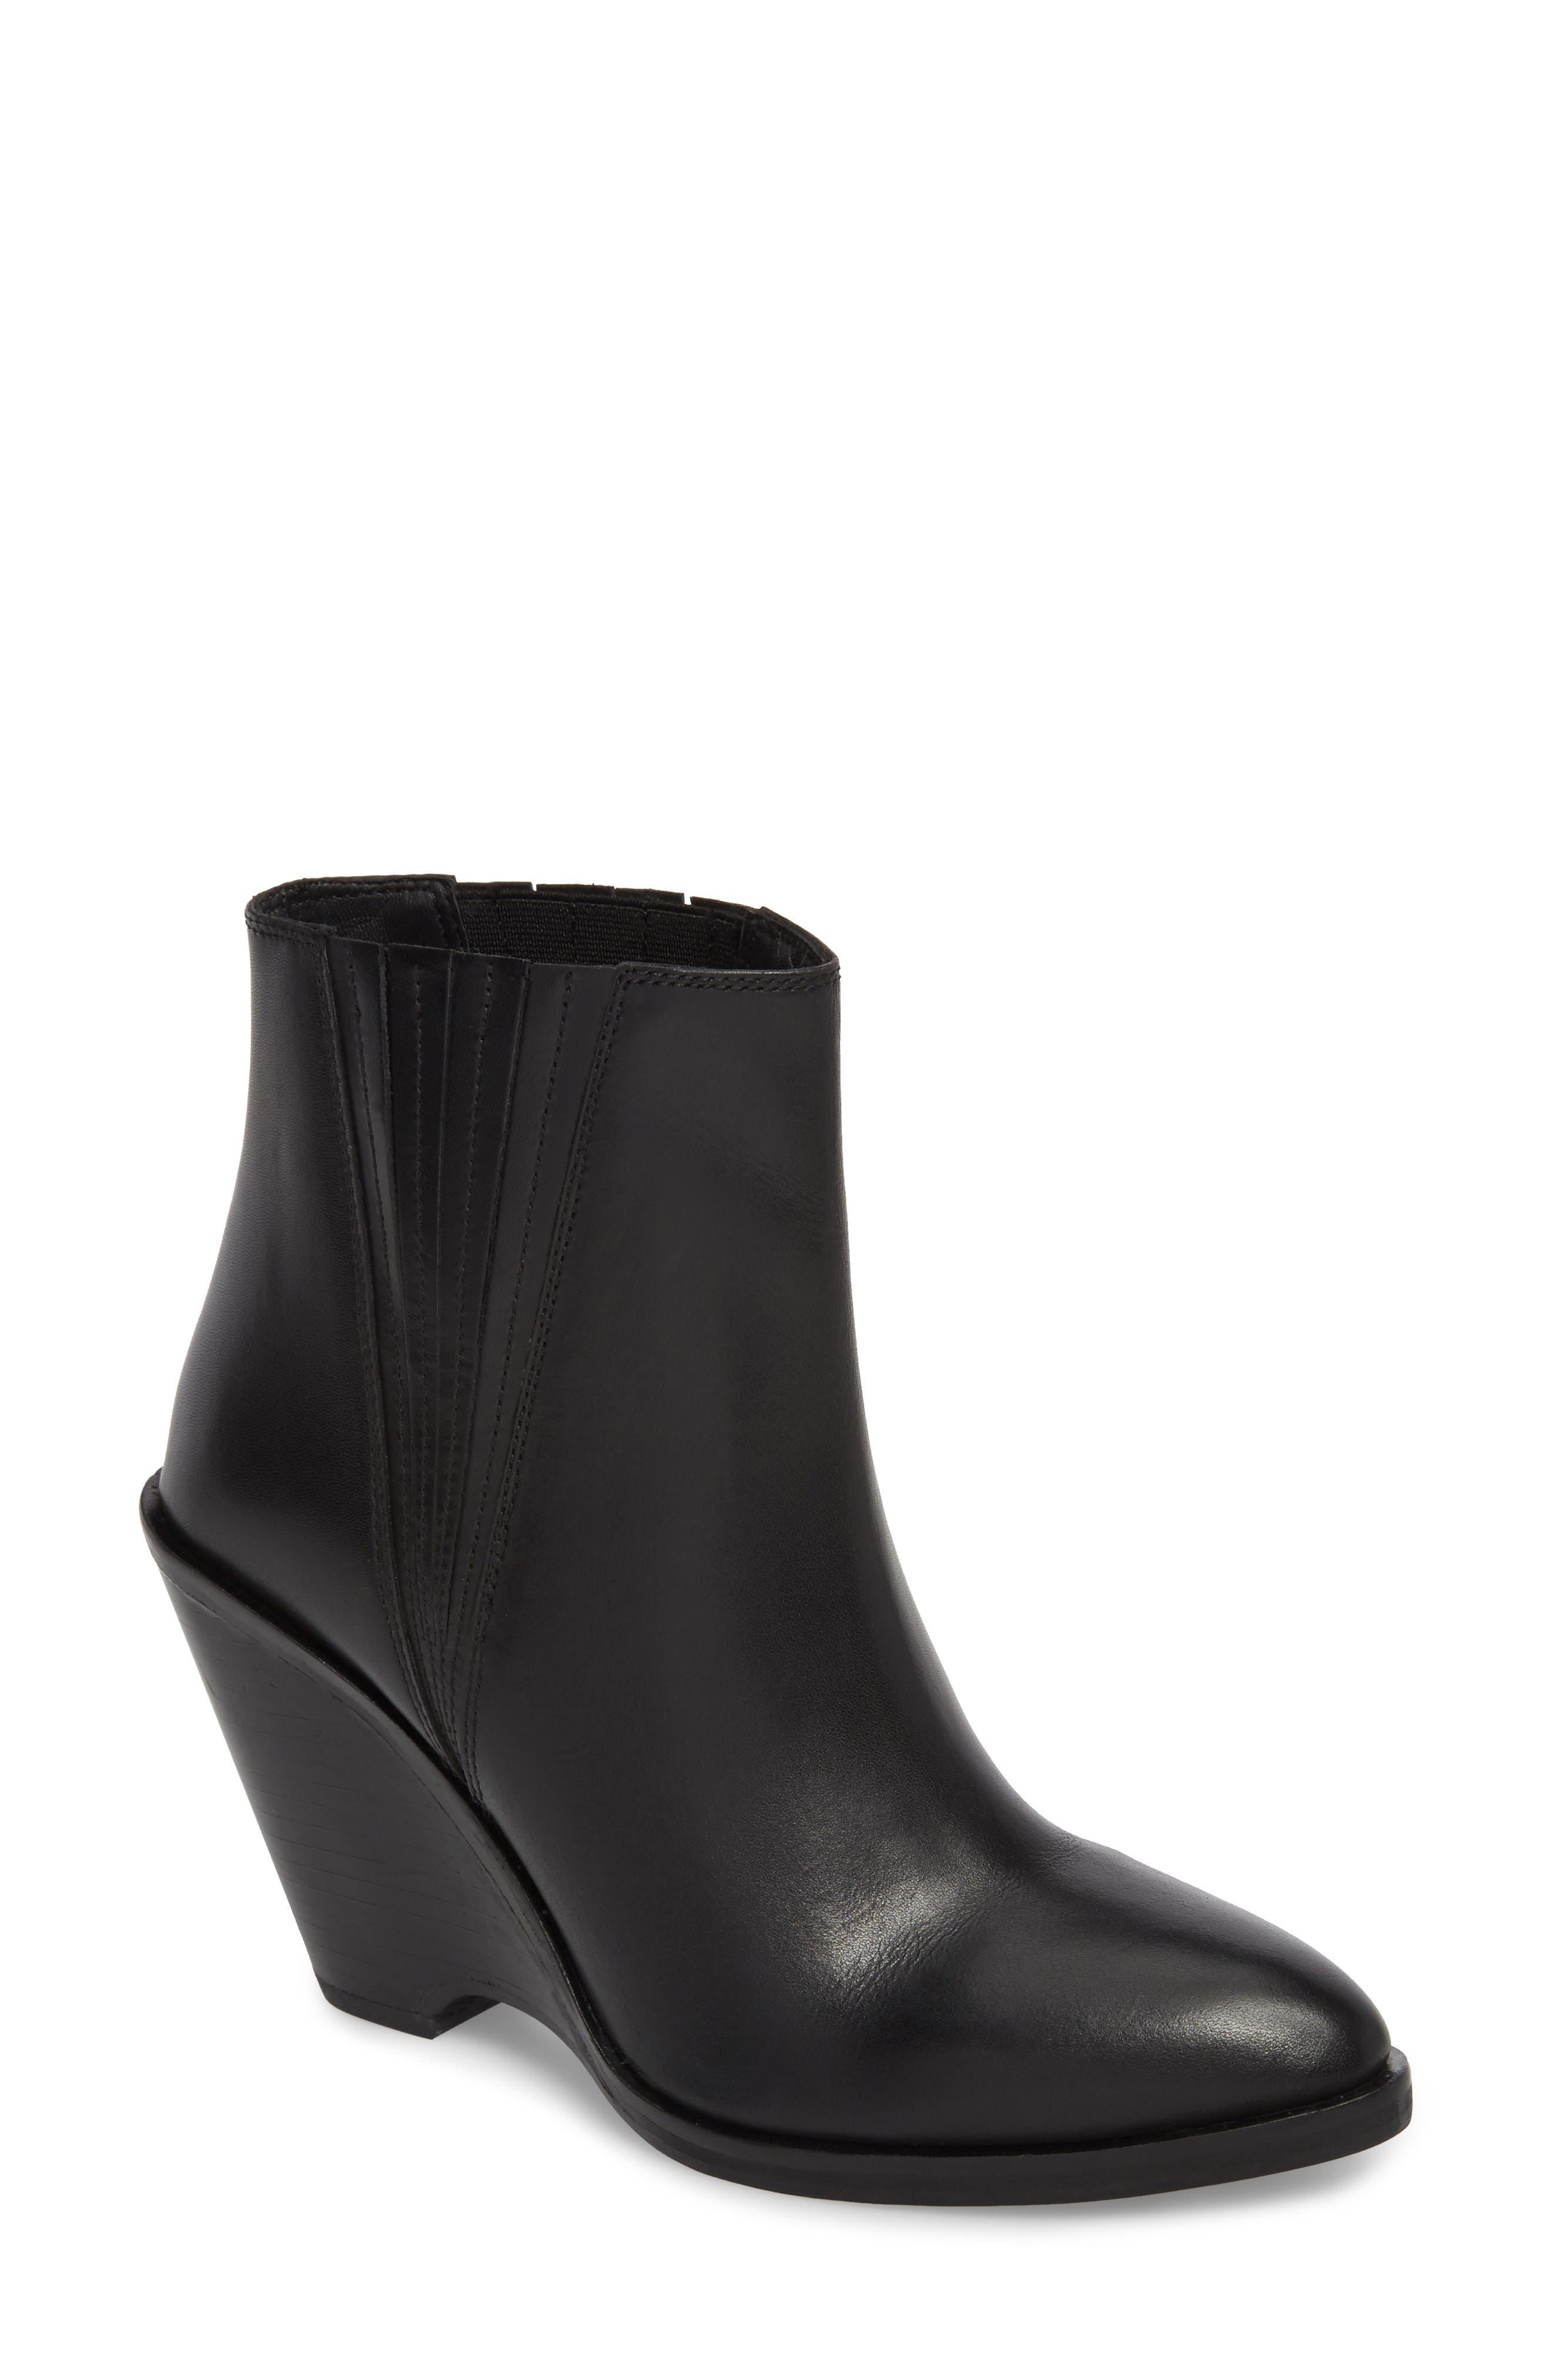 Park Demi Wedge Bootie,                         Main,                         color, Black Leather